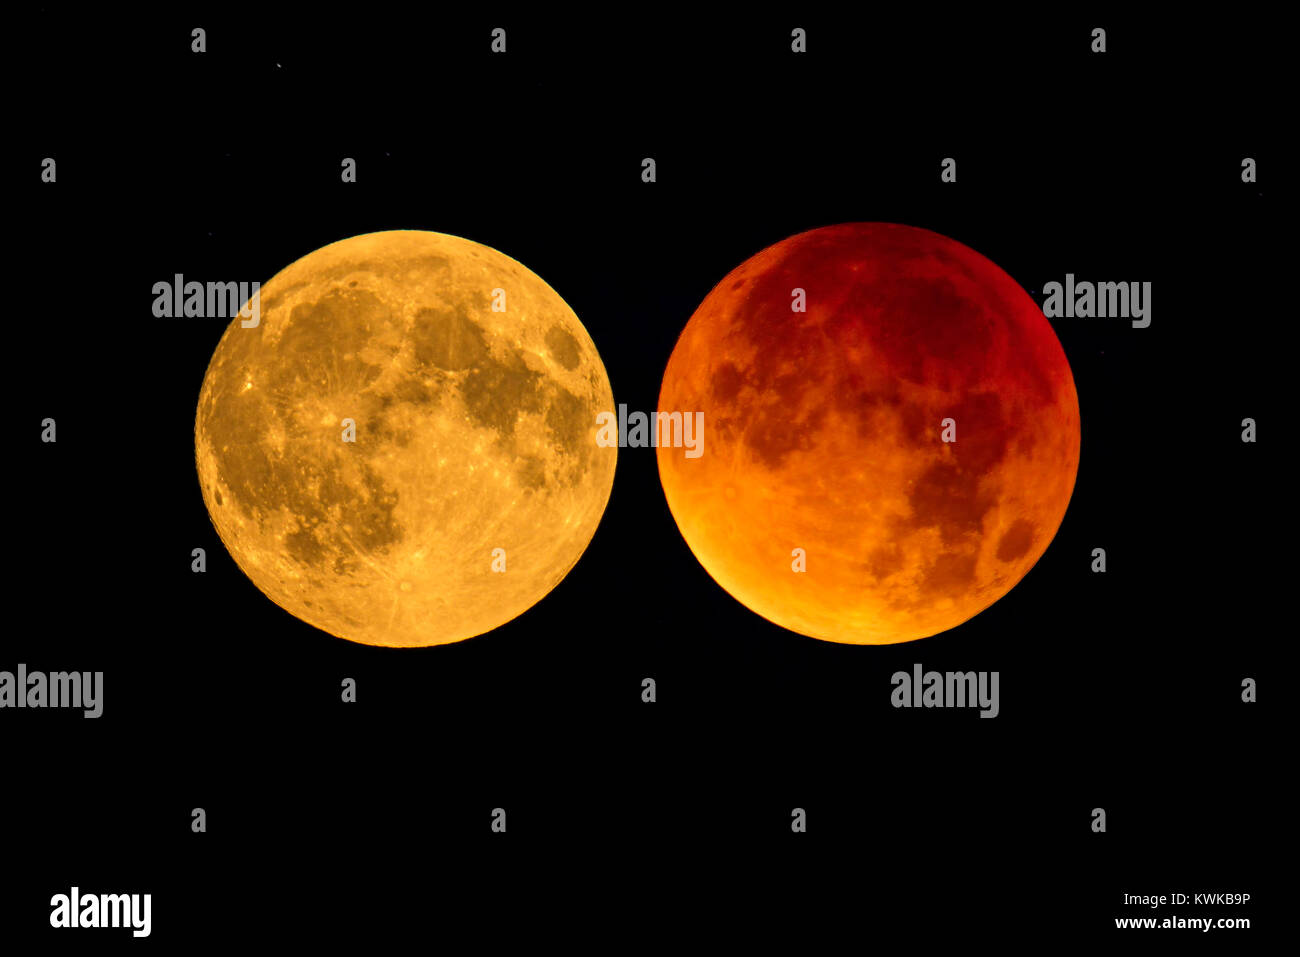 Full moon and blood moon, Vollmond und Blutmond - Stock Image